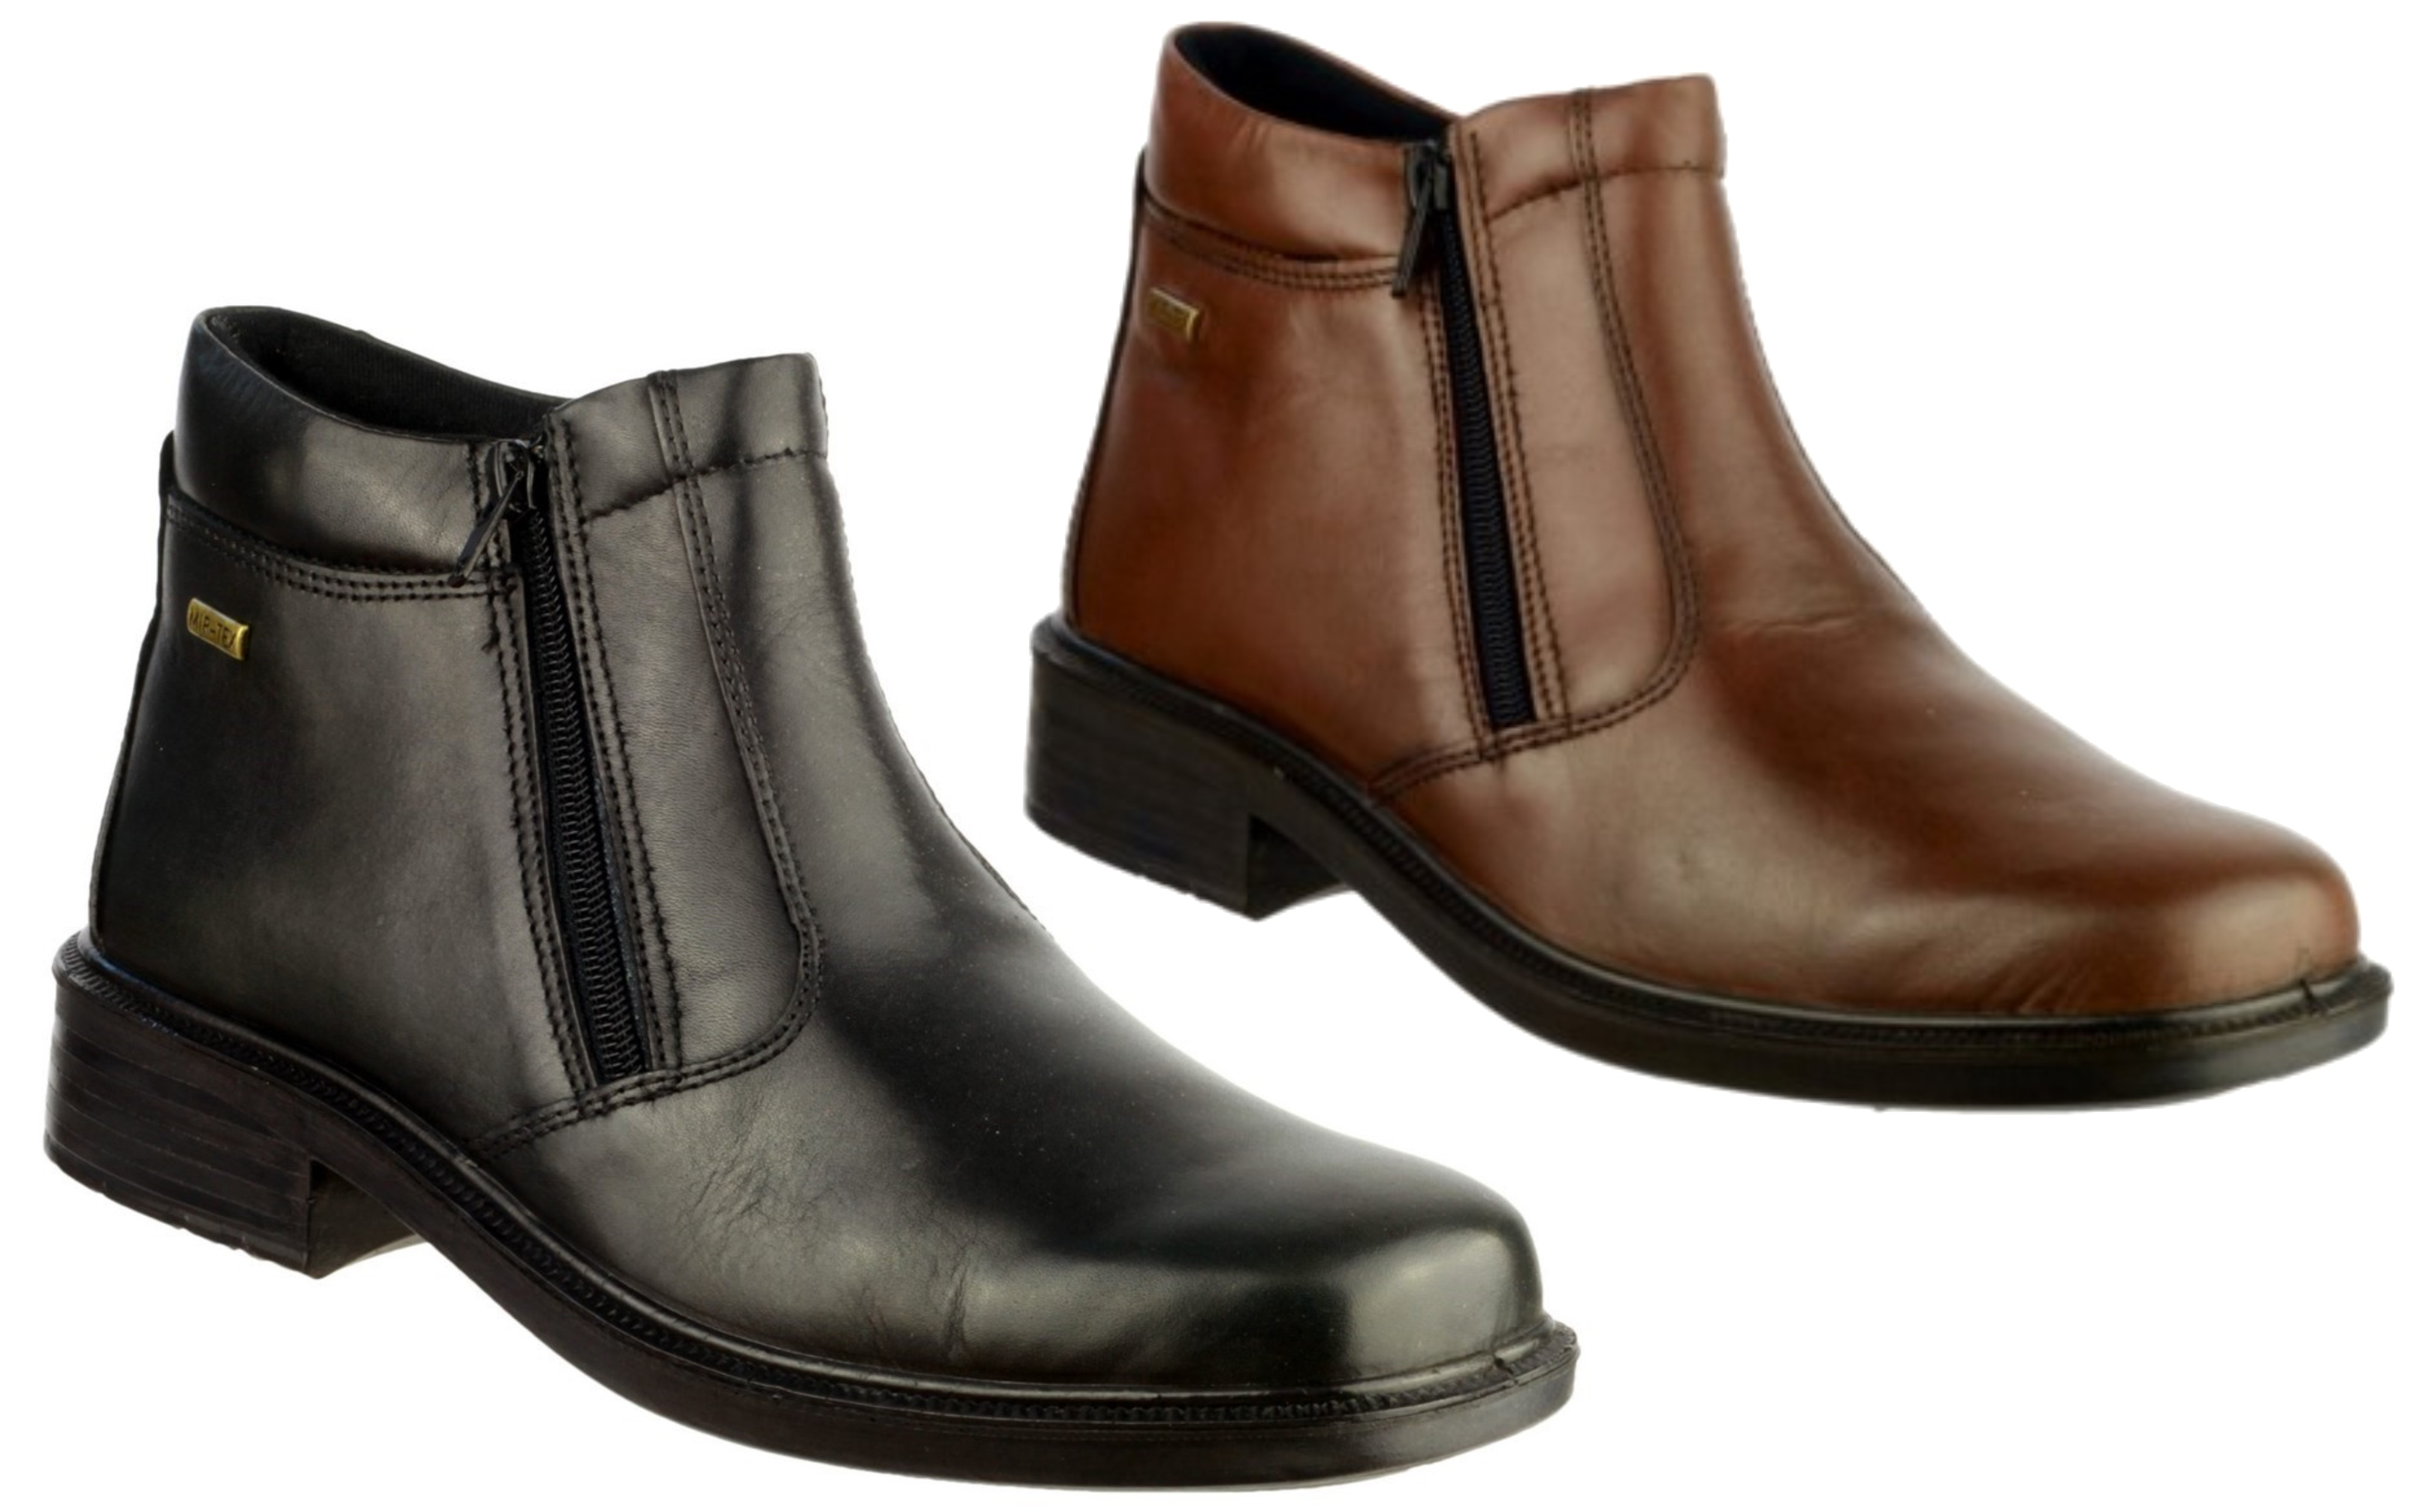 Cotswold Kelmscott black or brown leather waterproof zip up ankle boot